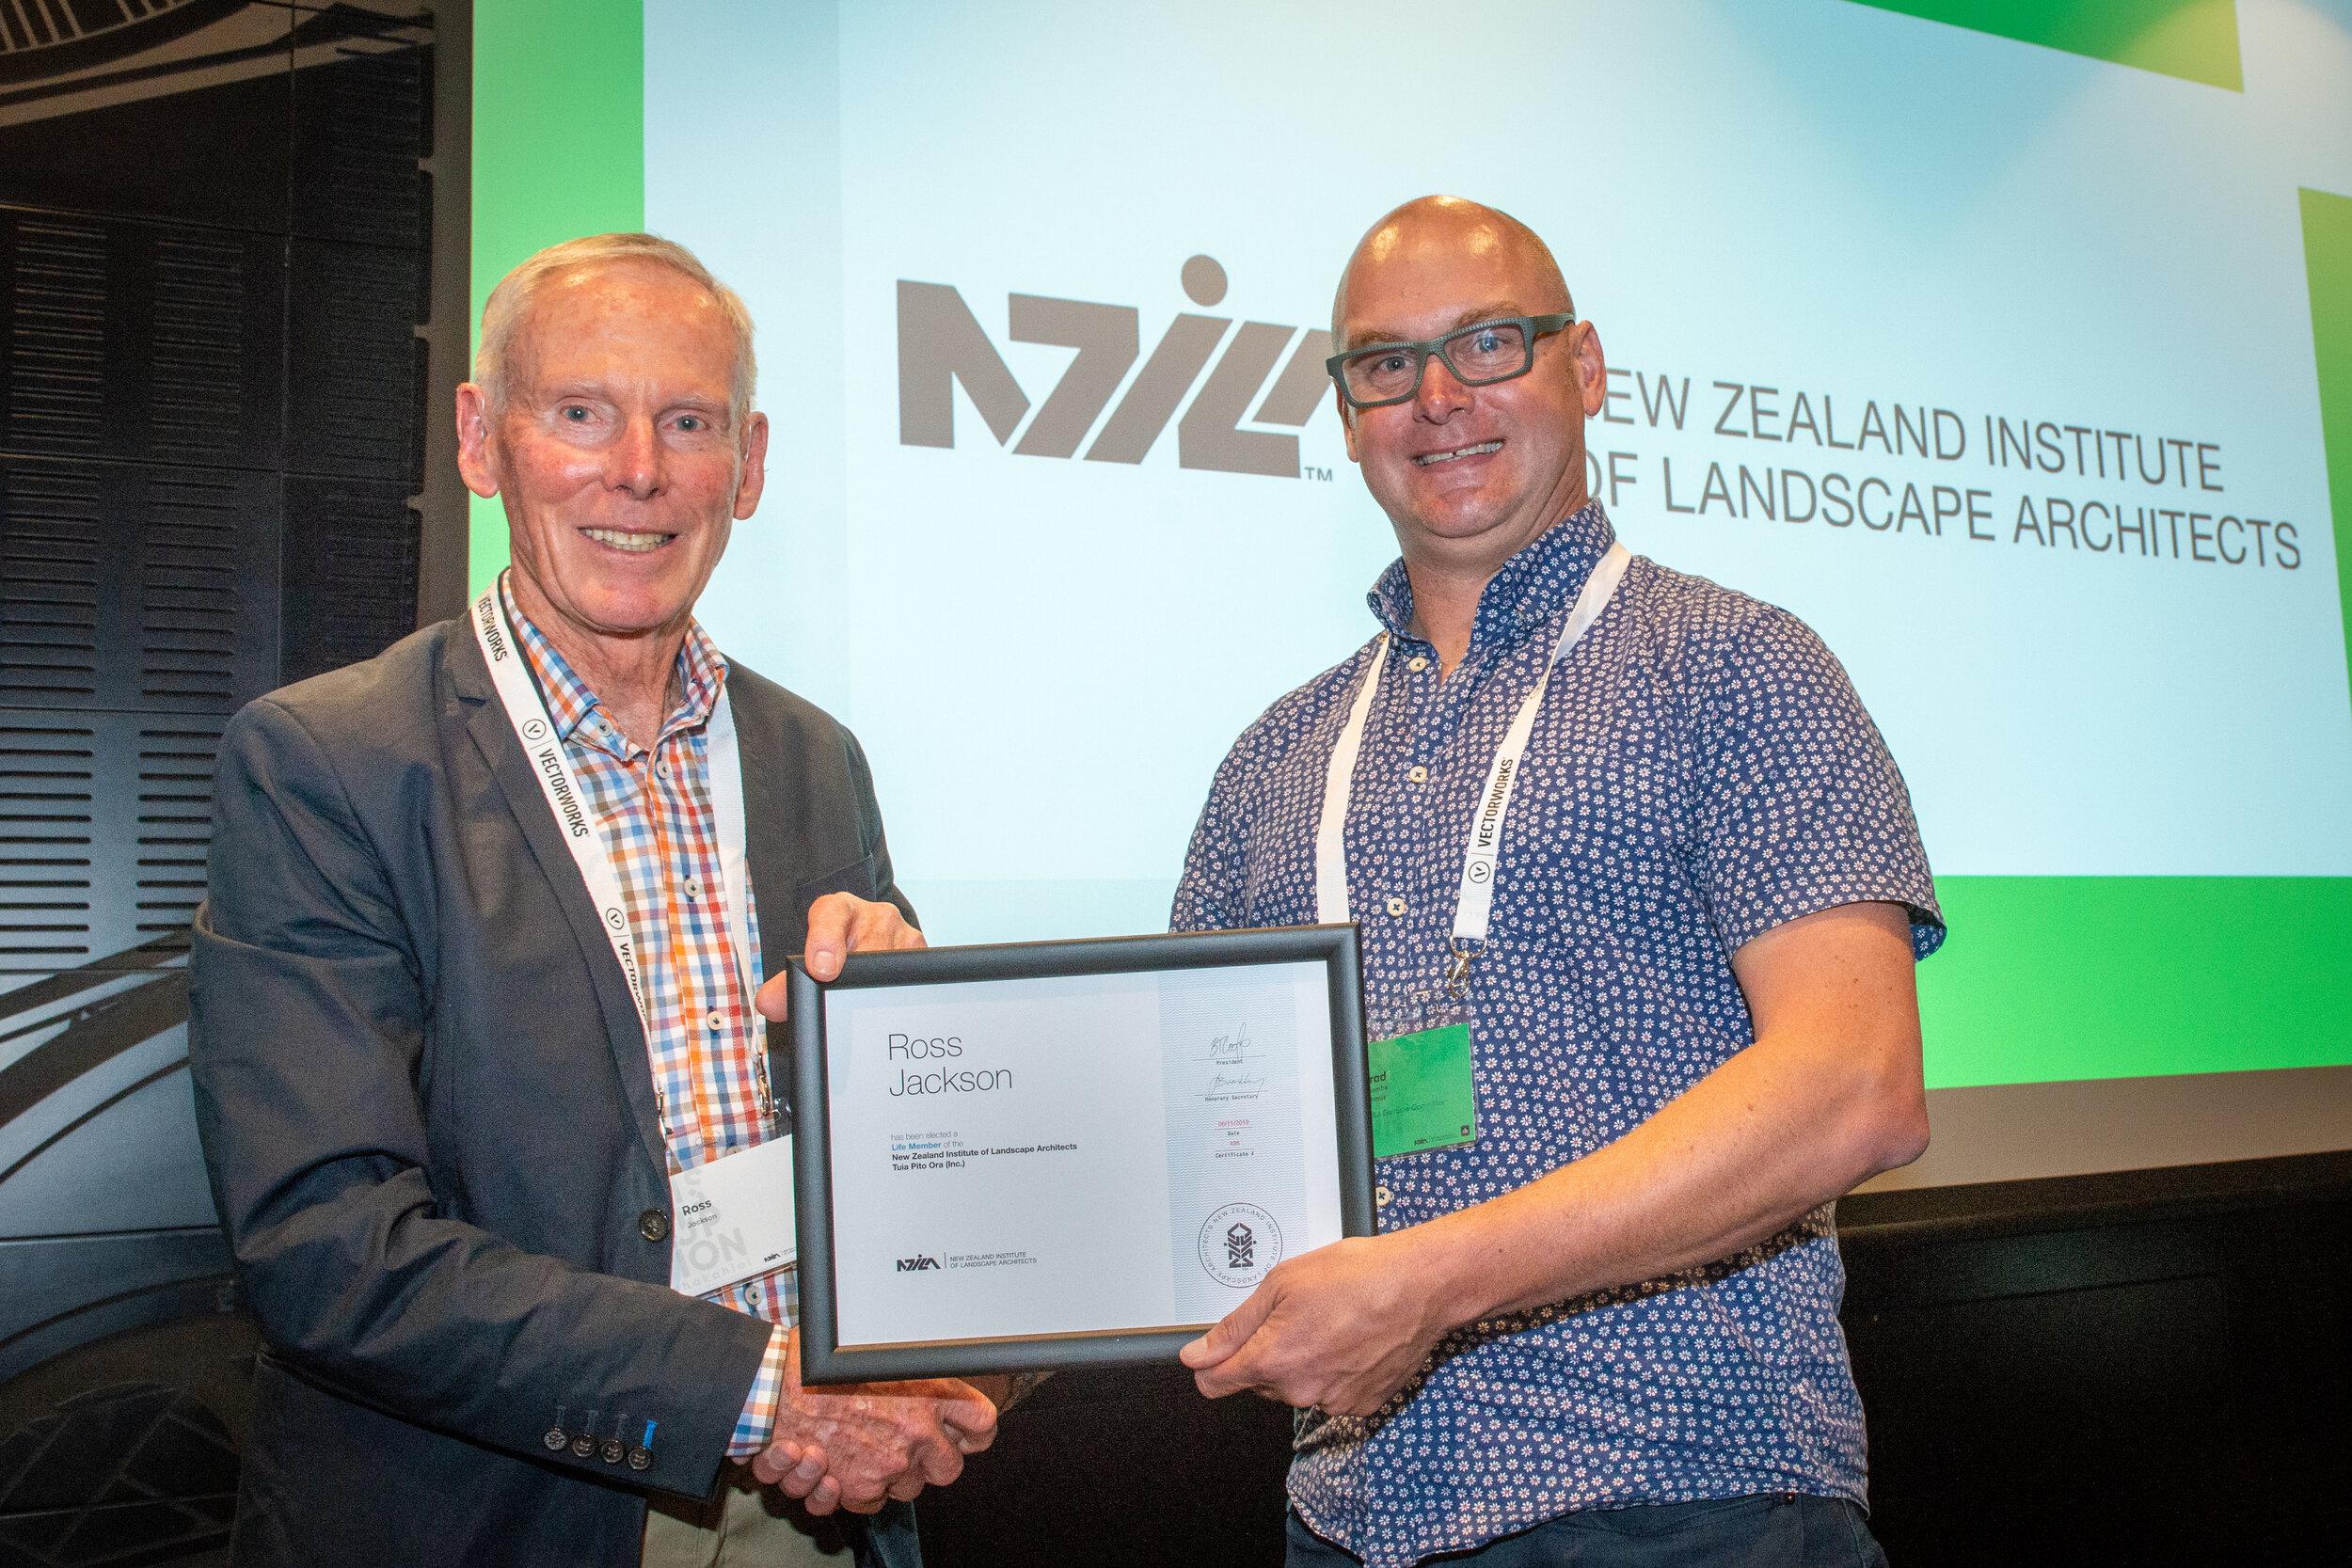 NZILA President Brad Coombs presents Ross Jackson with his life membership.